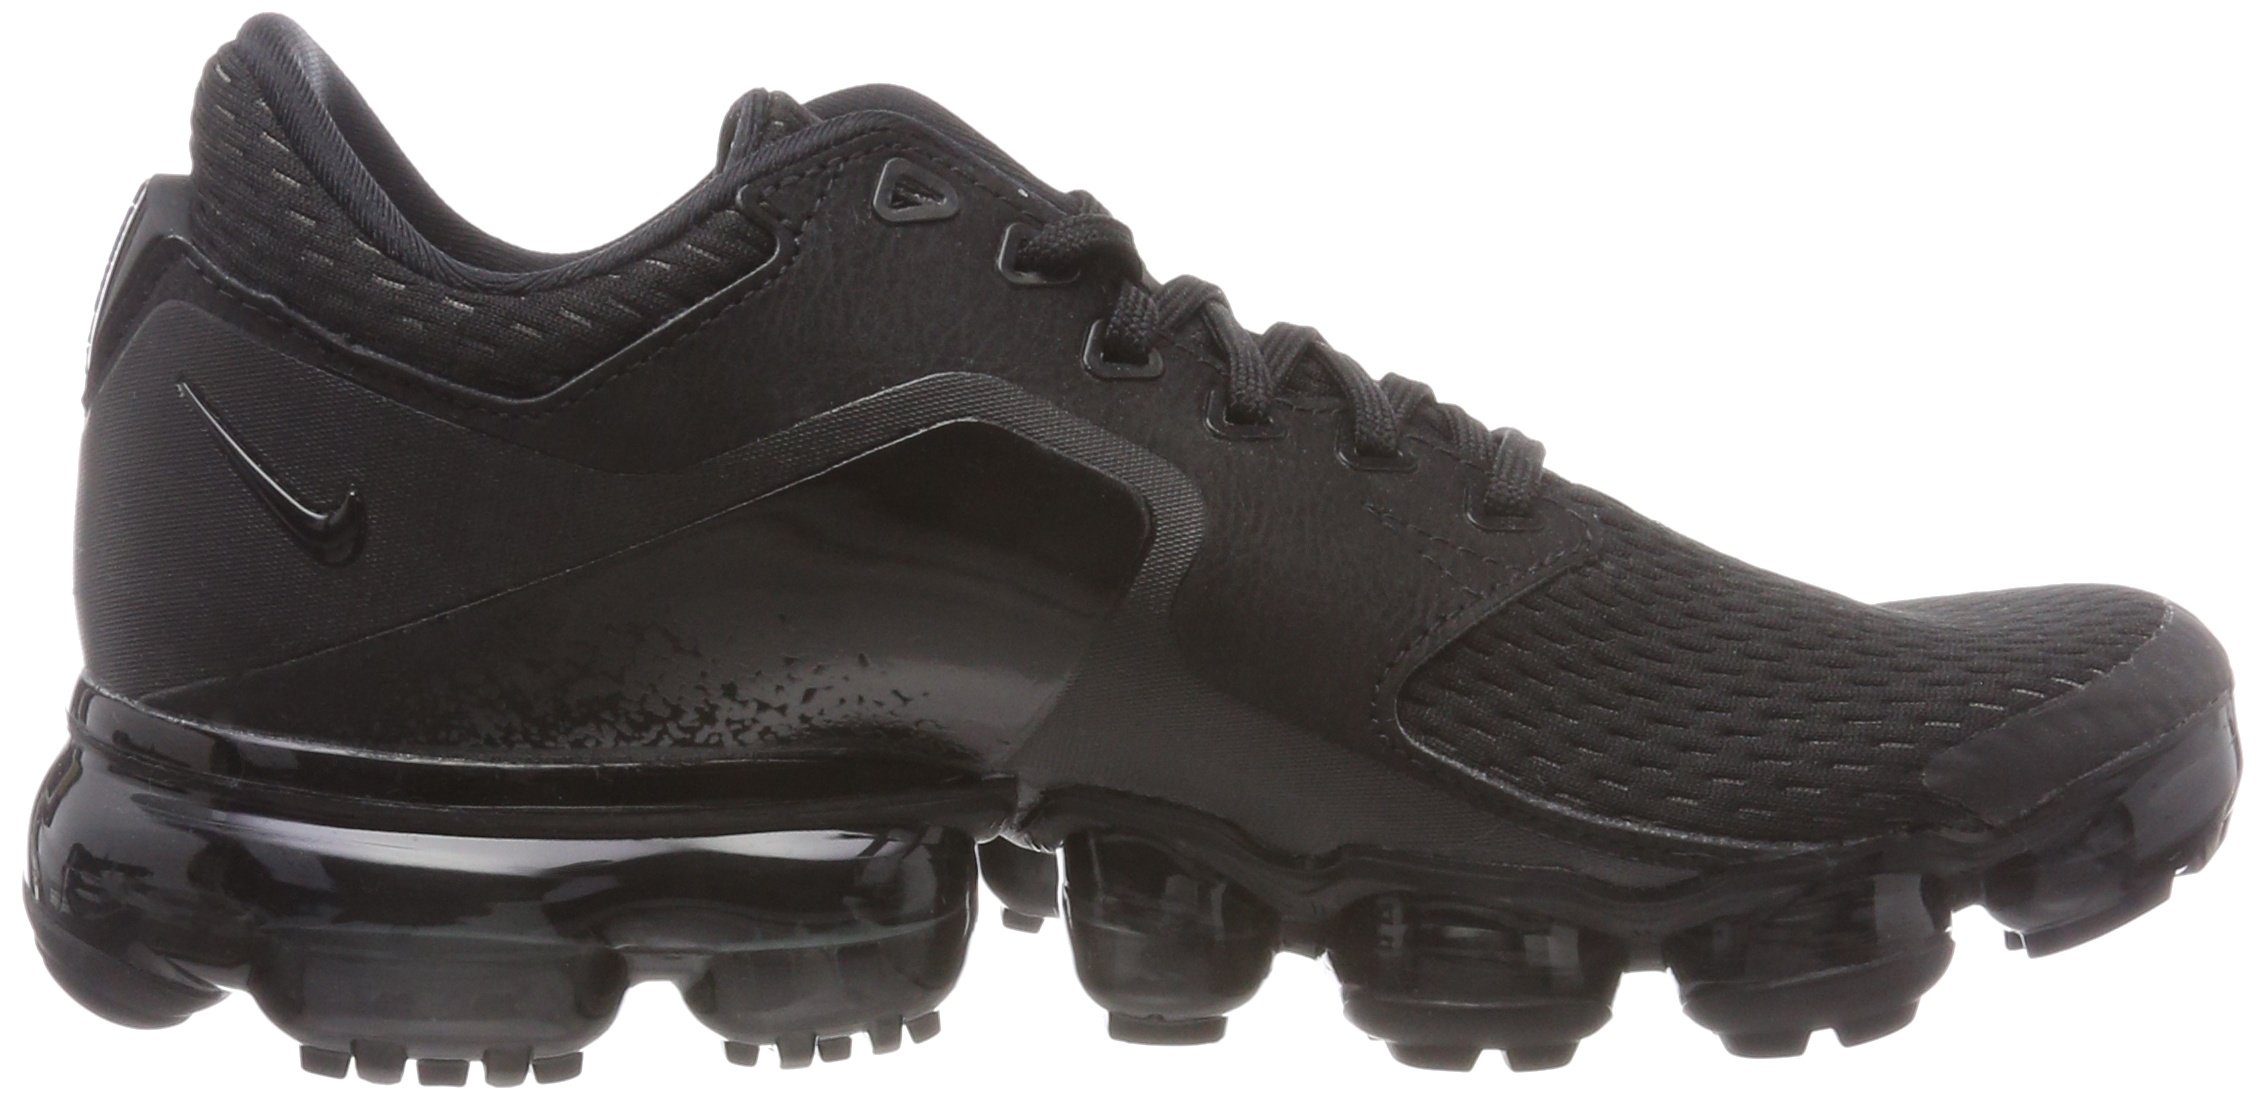 Nike Kids' Grade School Air Vapormax Running Shoes (5.5) by Nike (Image #5)